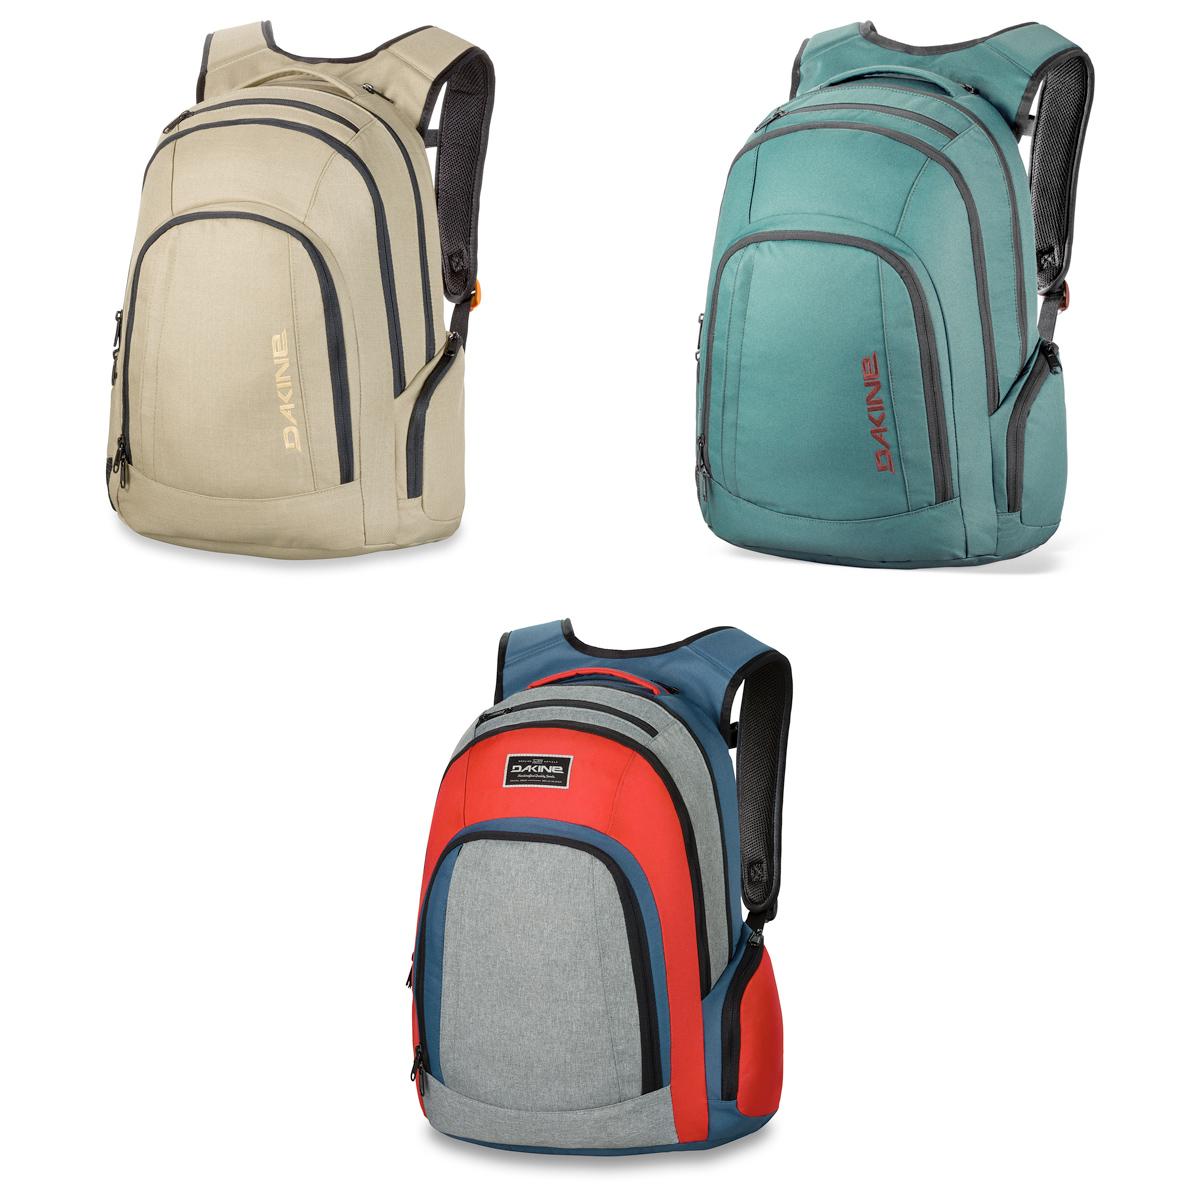 Dakine 101 29L Backpack 2015 | | Mens | The Board Basement